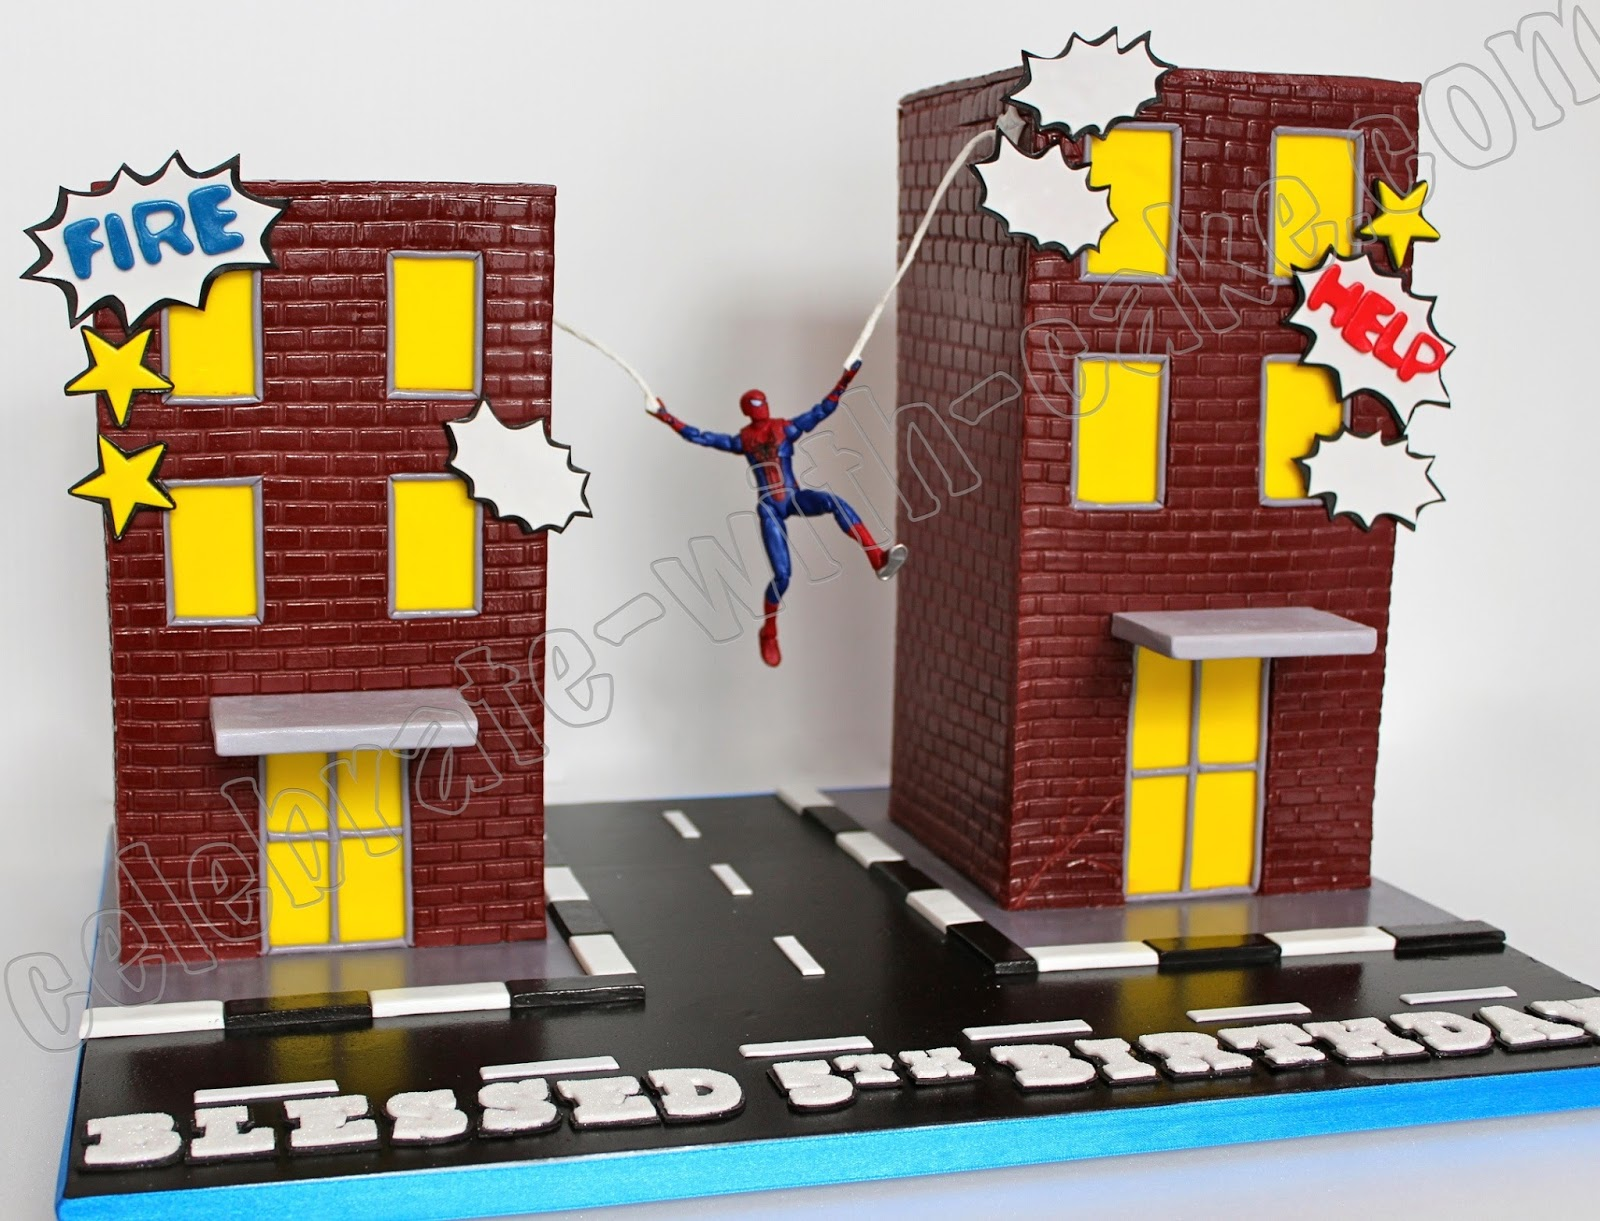 celebrate with cake spiderman buildings cake